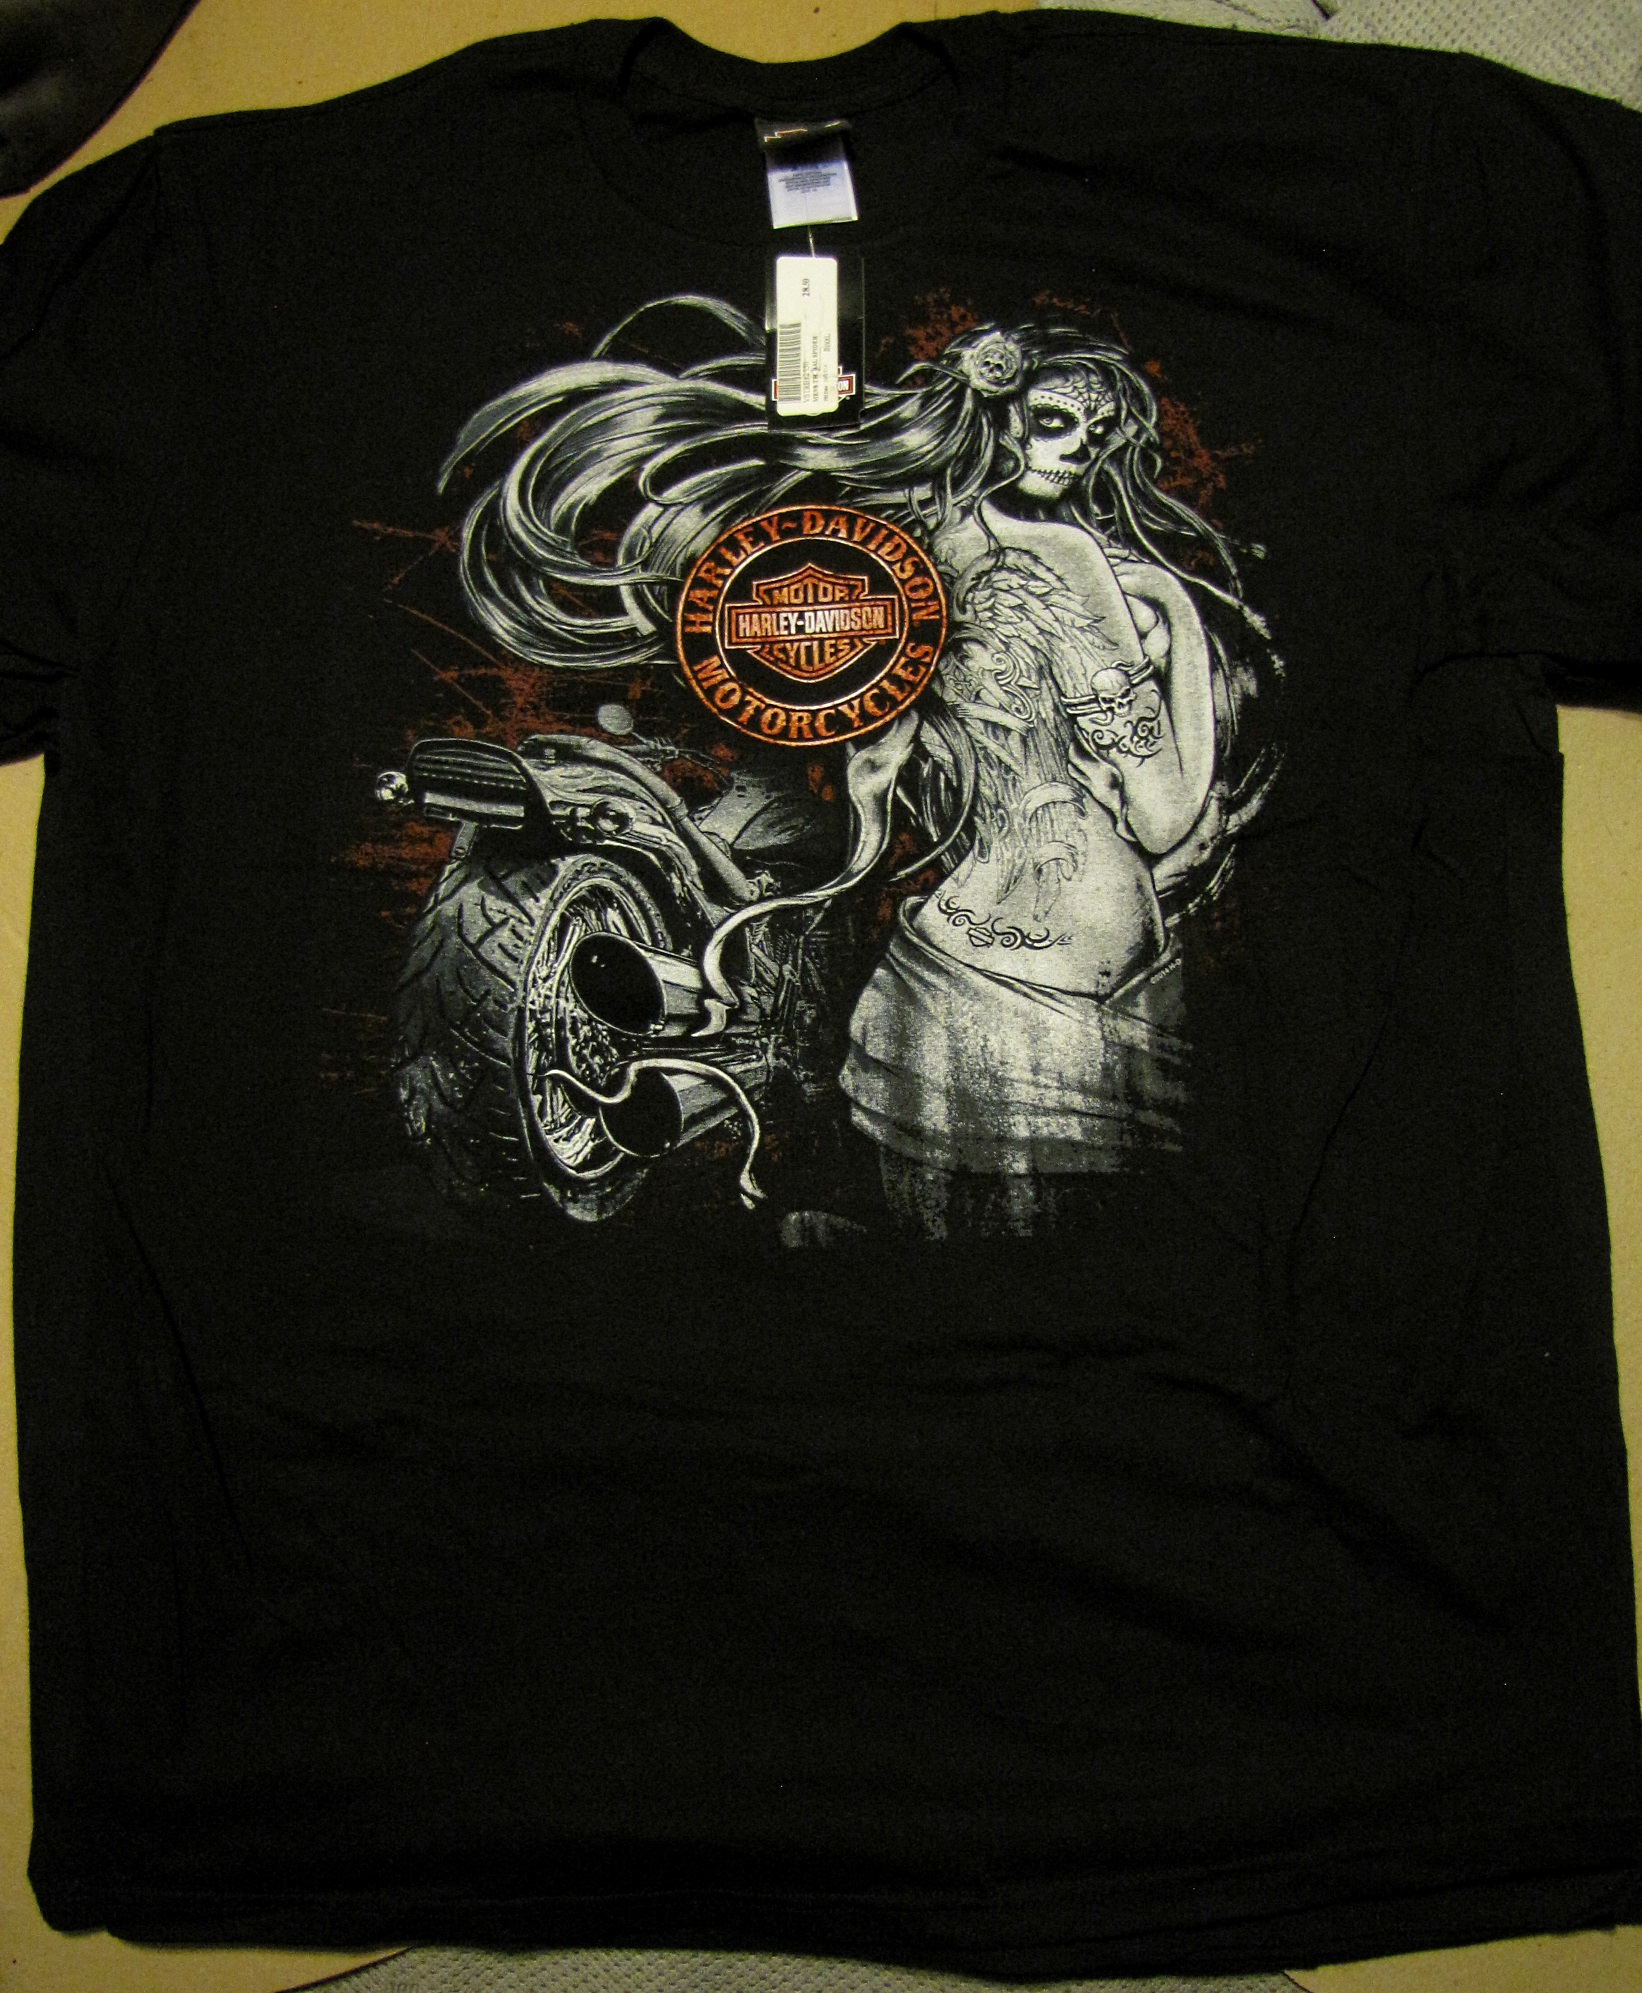 Black t shirt xl -  Hd 11 Black Widow Harley Davidson T Shirt Xl